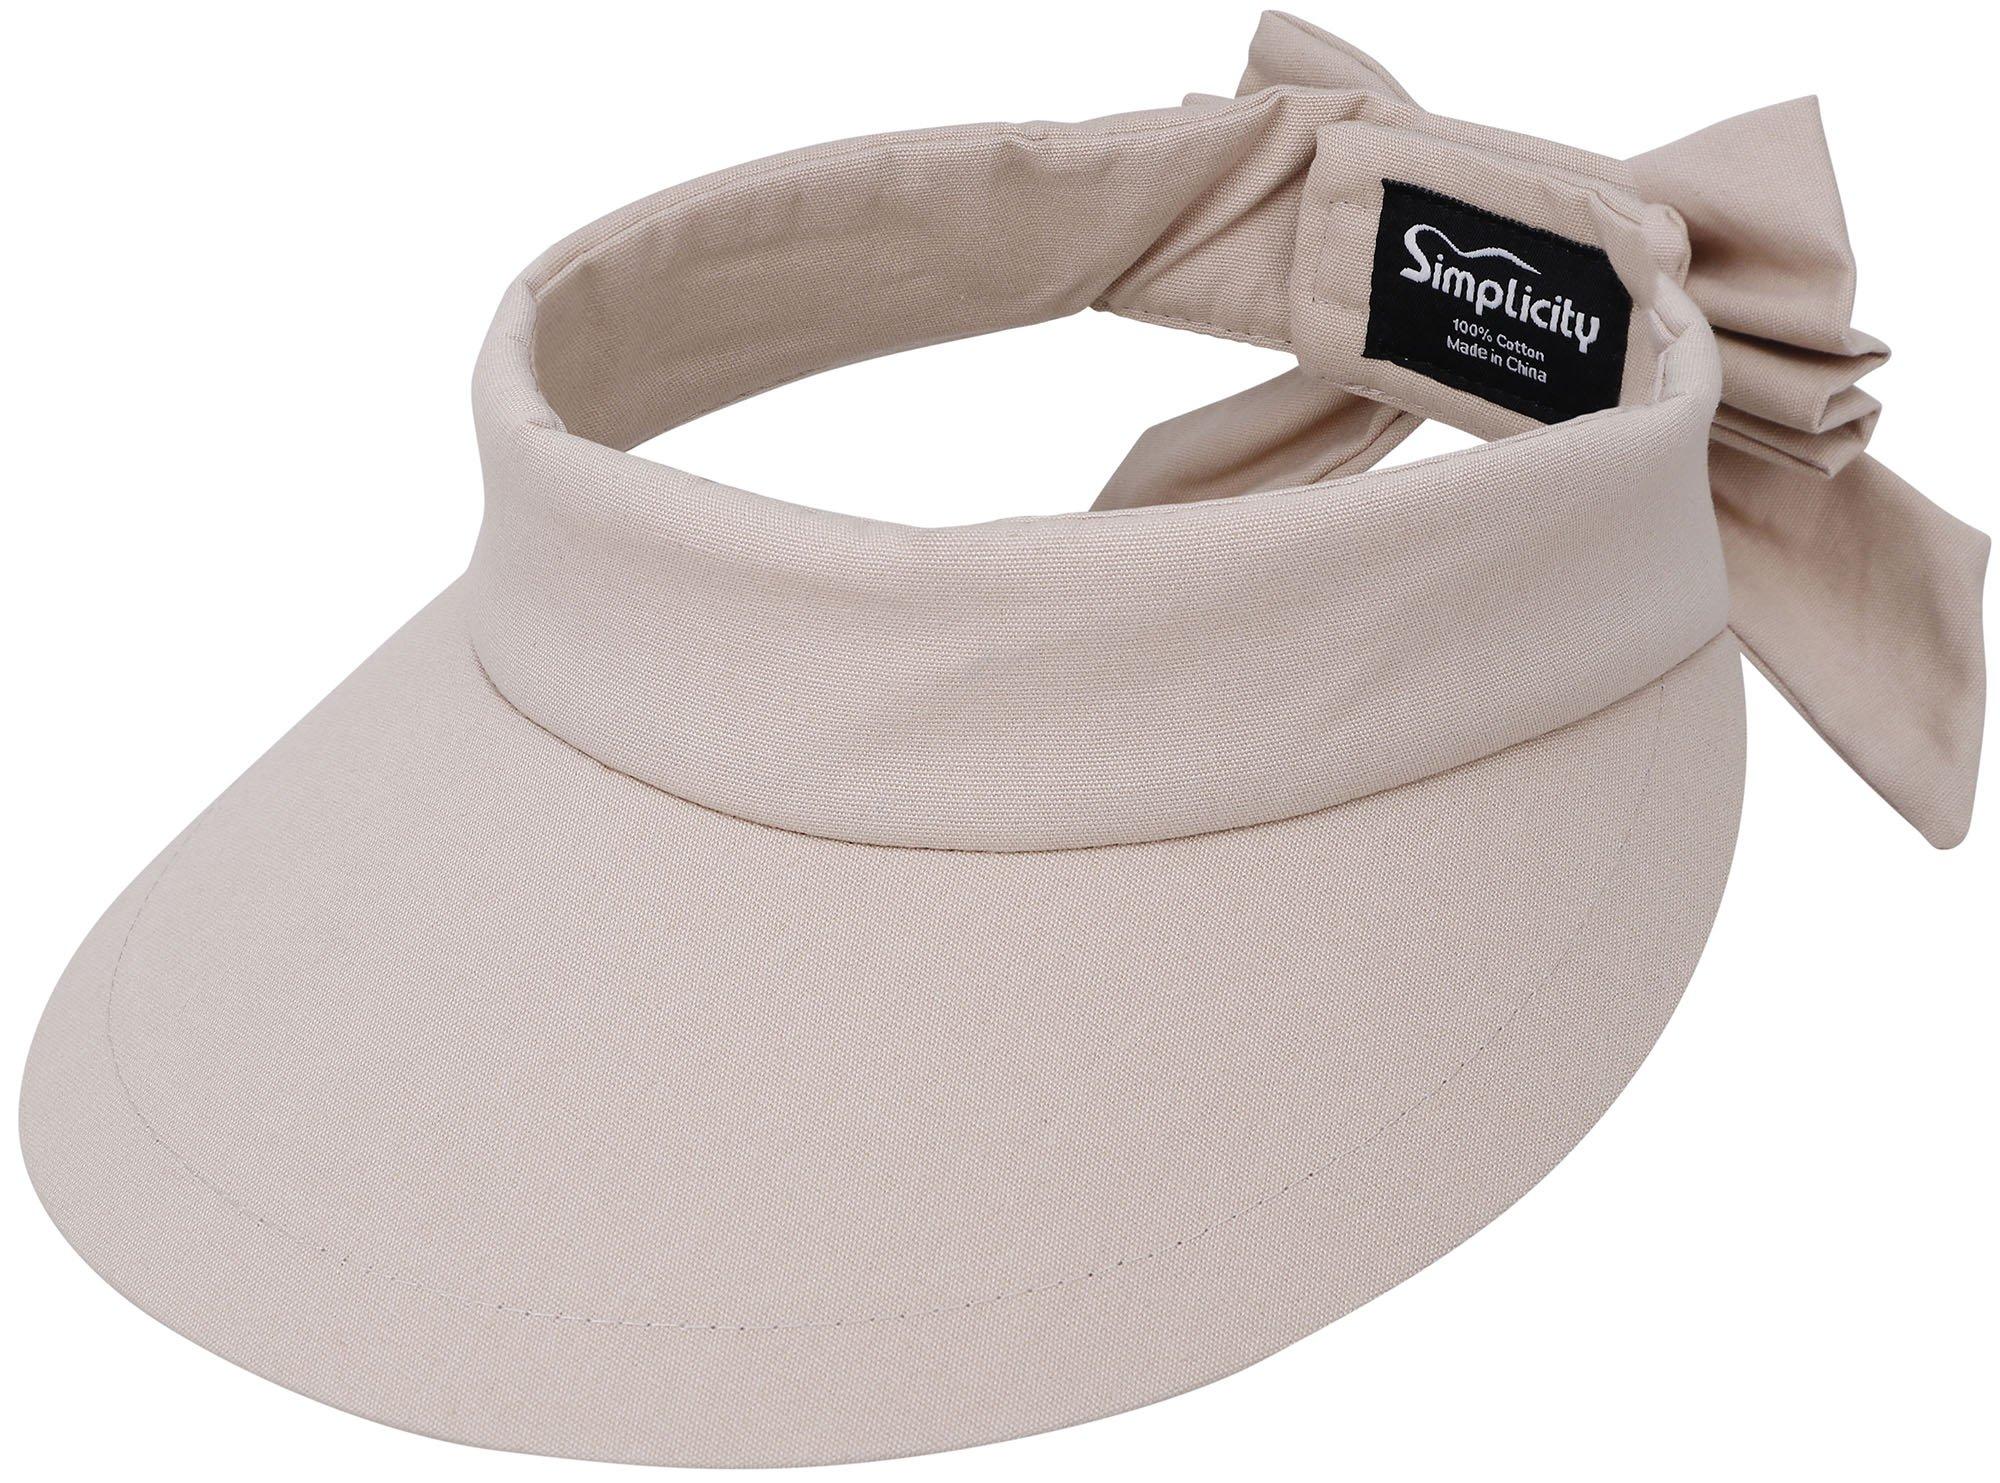 163bf62b Get Quotations · Simplicity Women's SPF 50+ UV Protection Wide Brim Beach  Sun Visor Hat